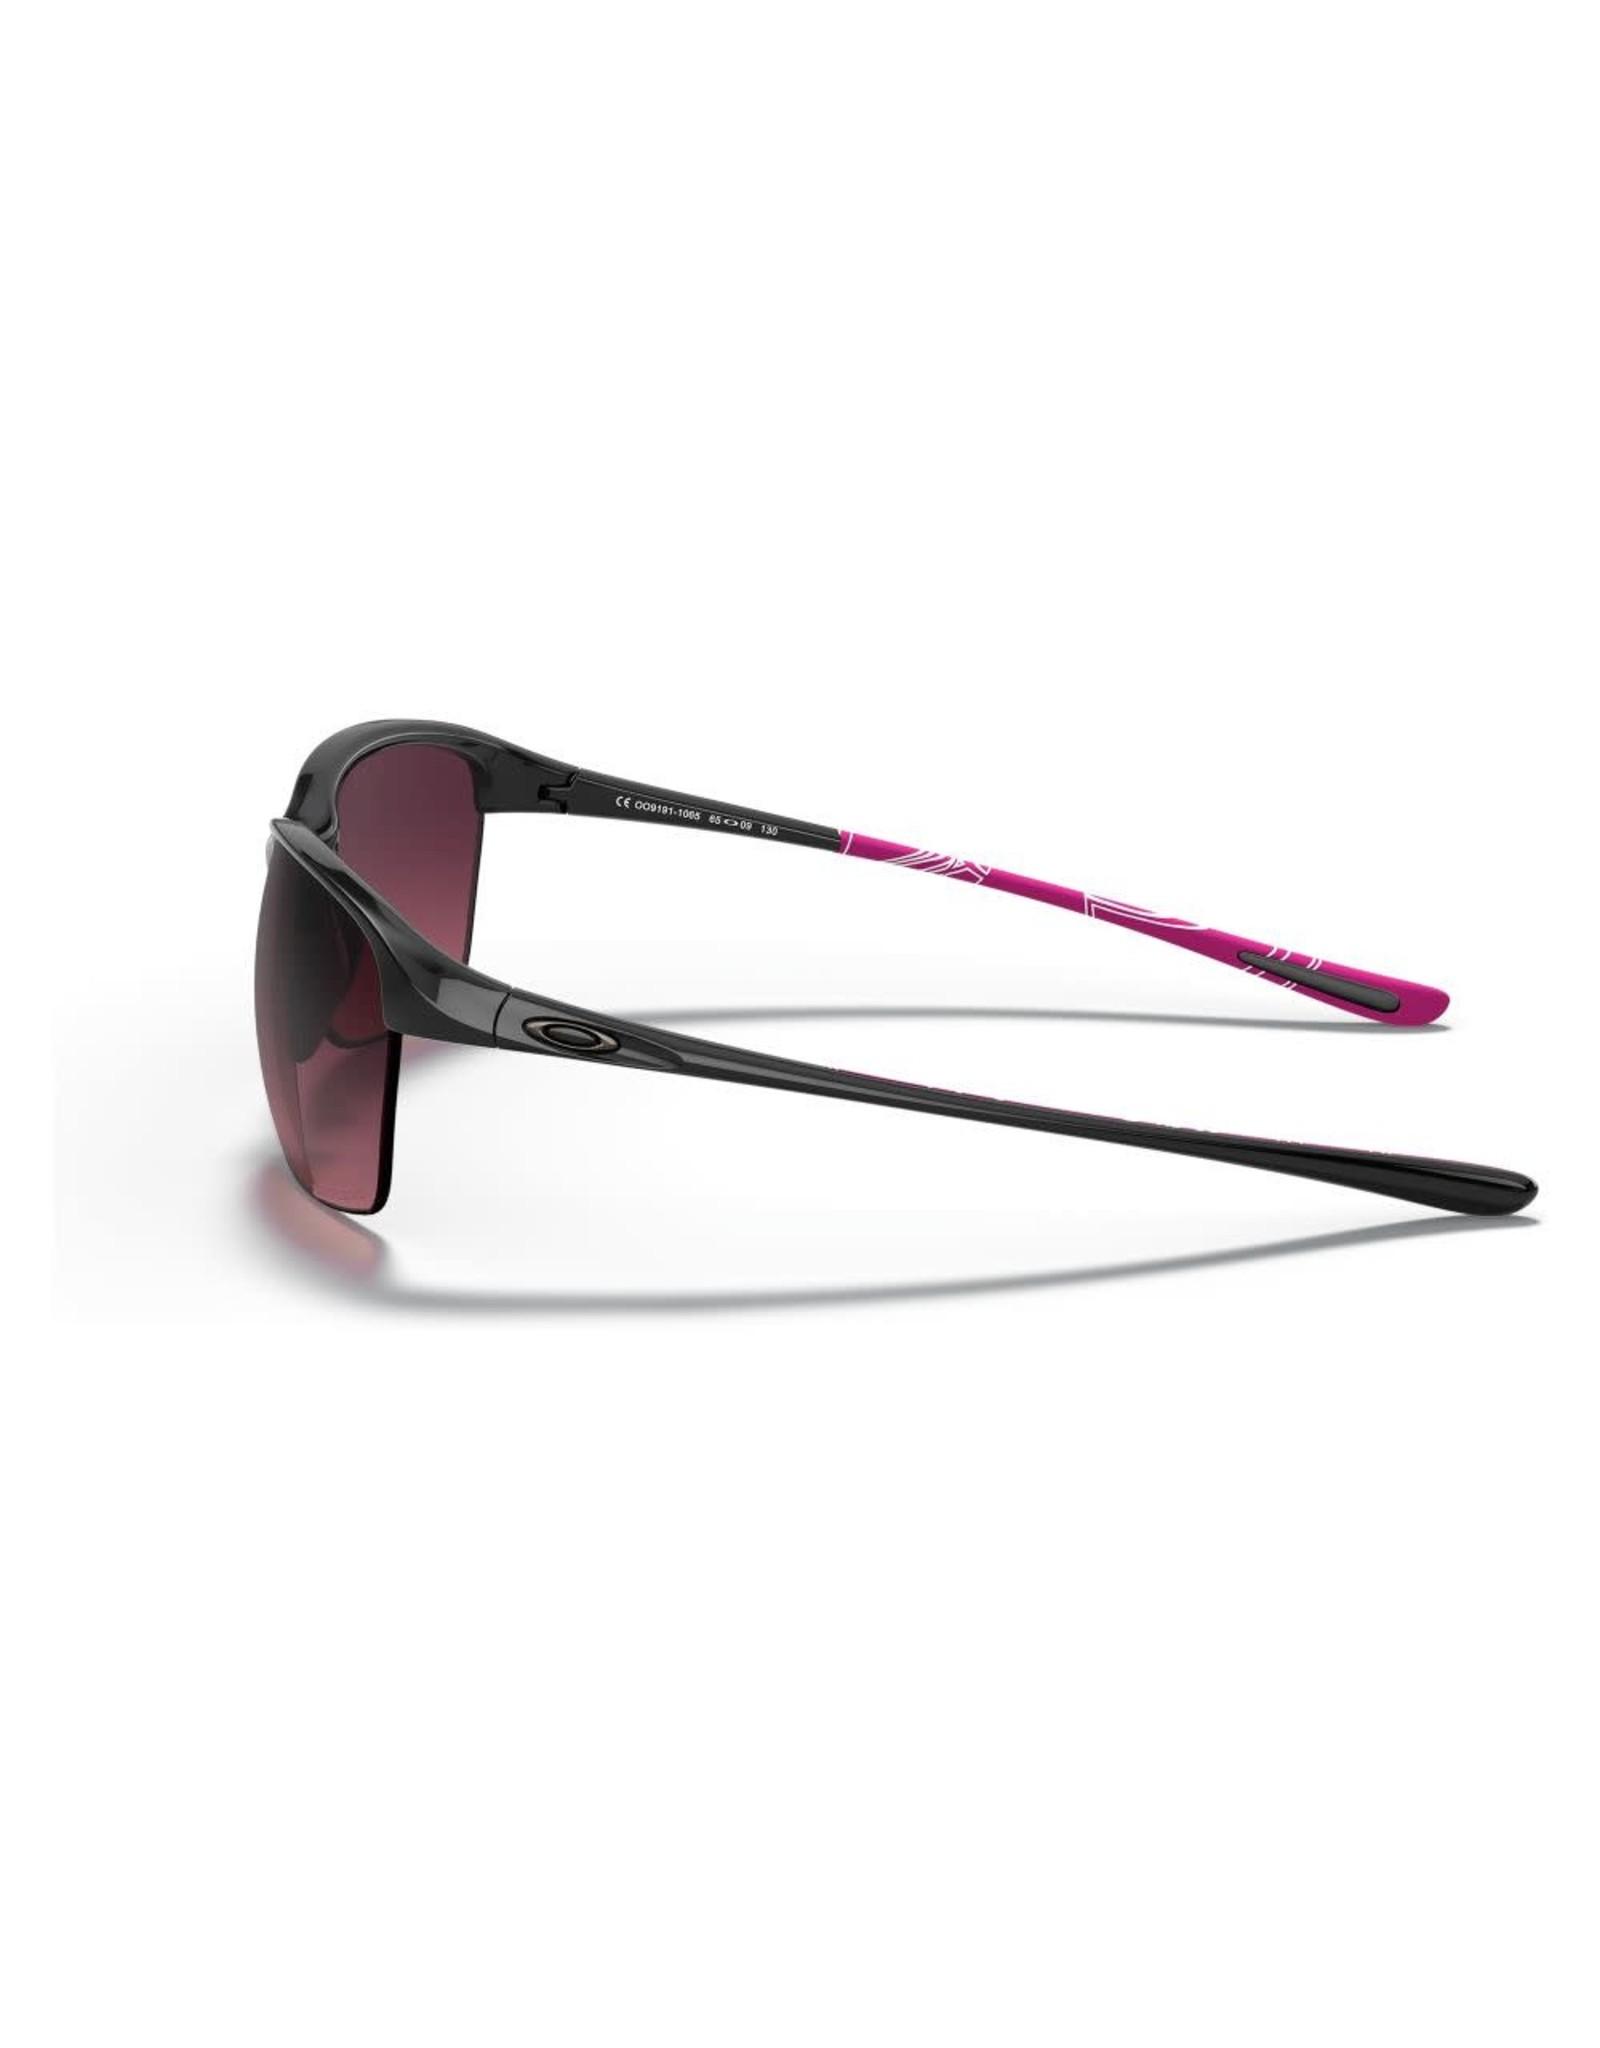 OAKLEY Oakley Unstoppable polished black-smokey rose gradient polarized sunglasses